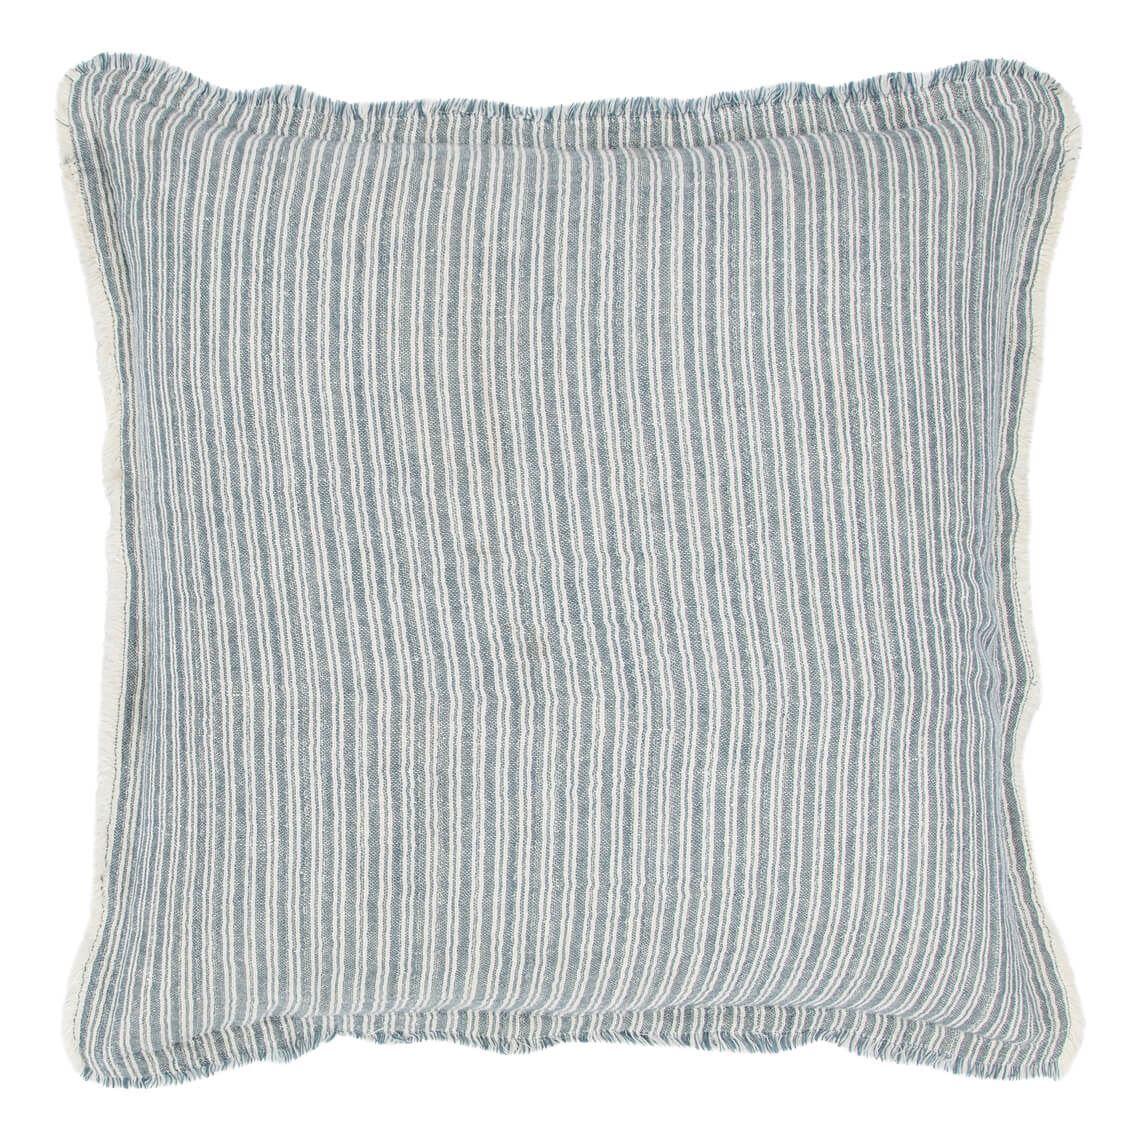 Amory Cushion Size W 55cm x D 15cm x H 55cm in Duck Egg Freedom